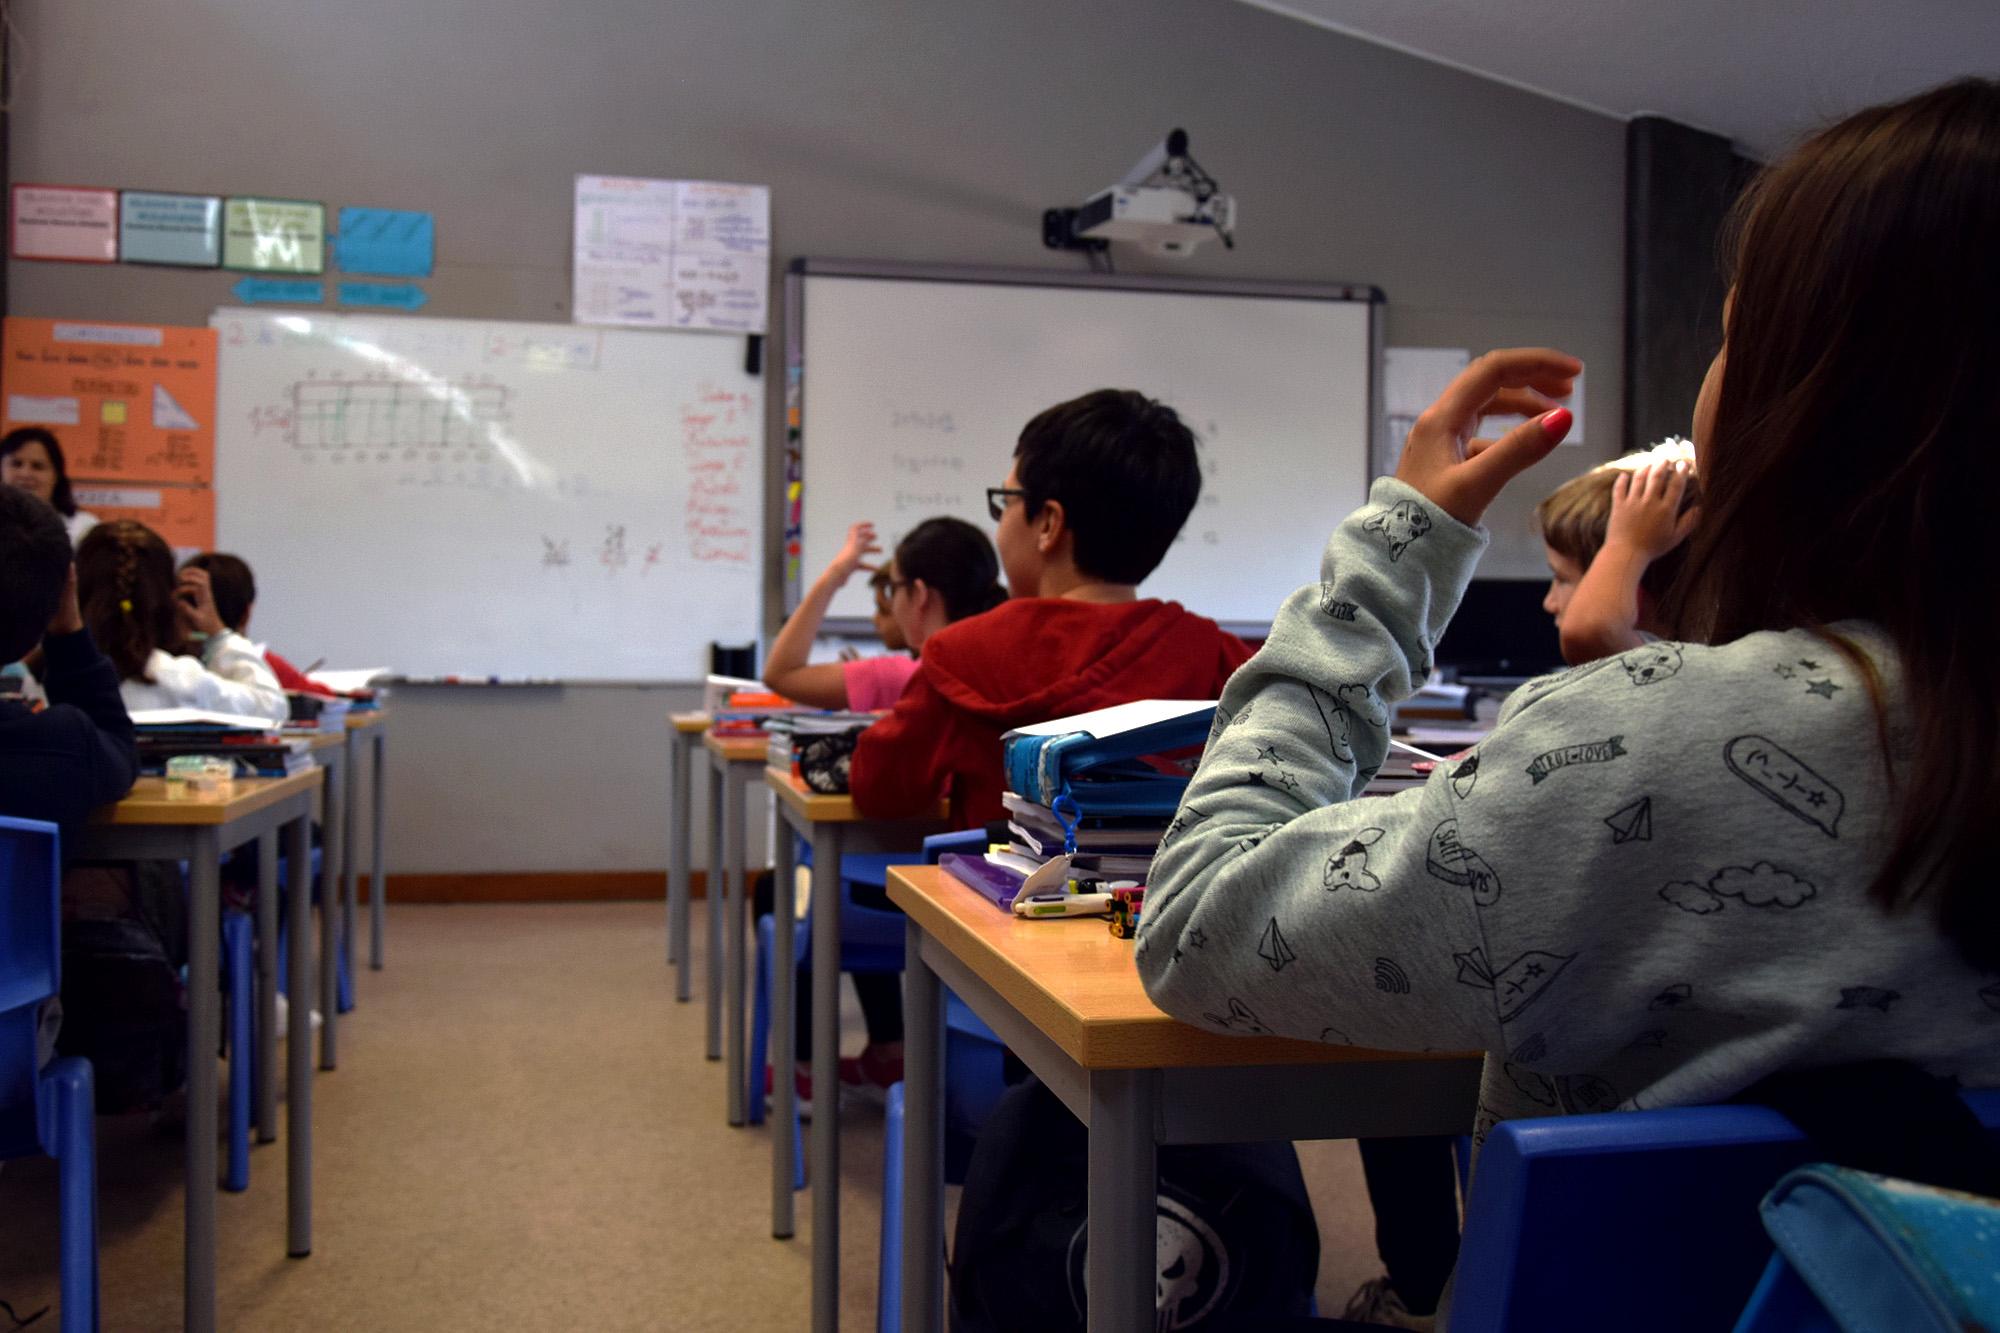 Aula de Língua Gestual Portuguesa na Escola Básica Augusto Lessa.